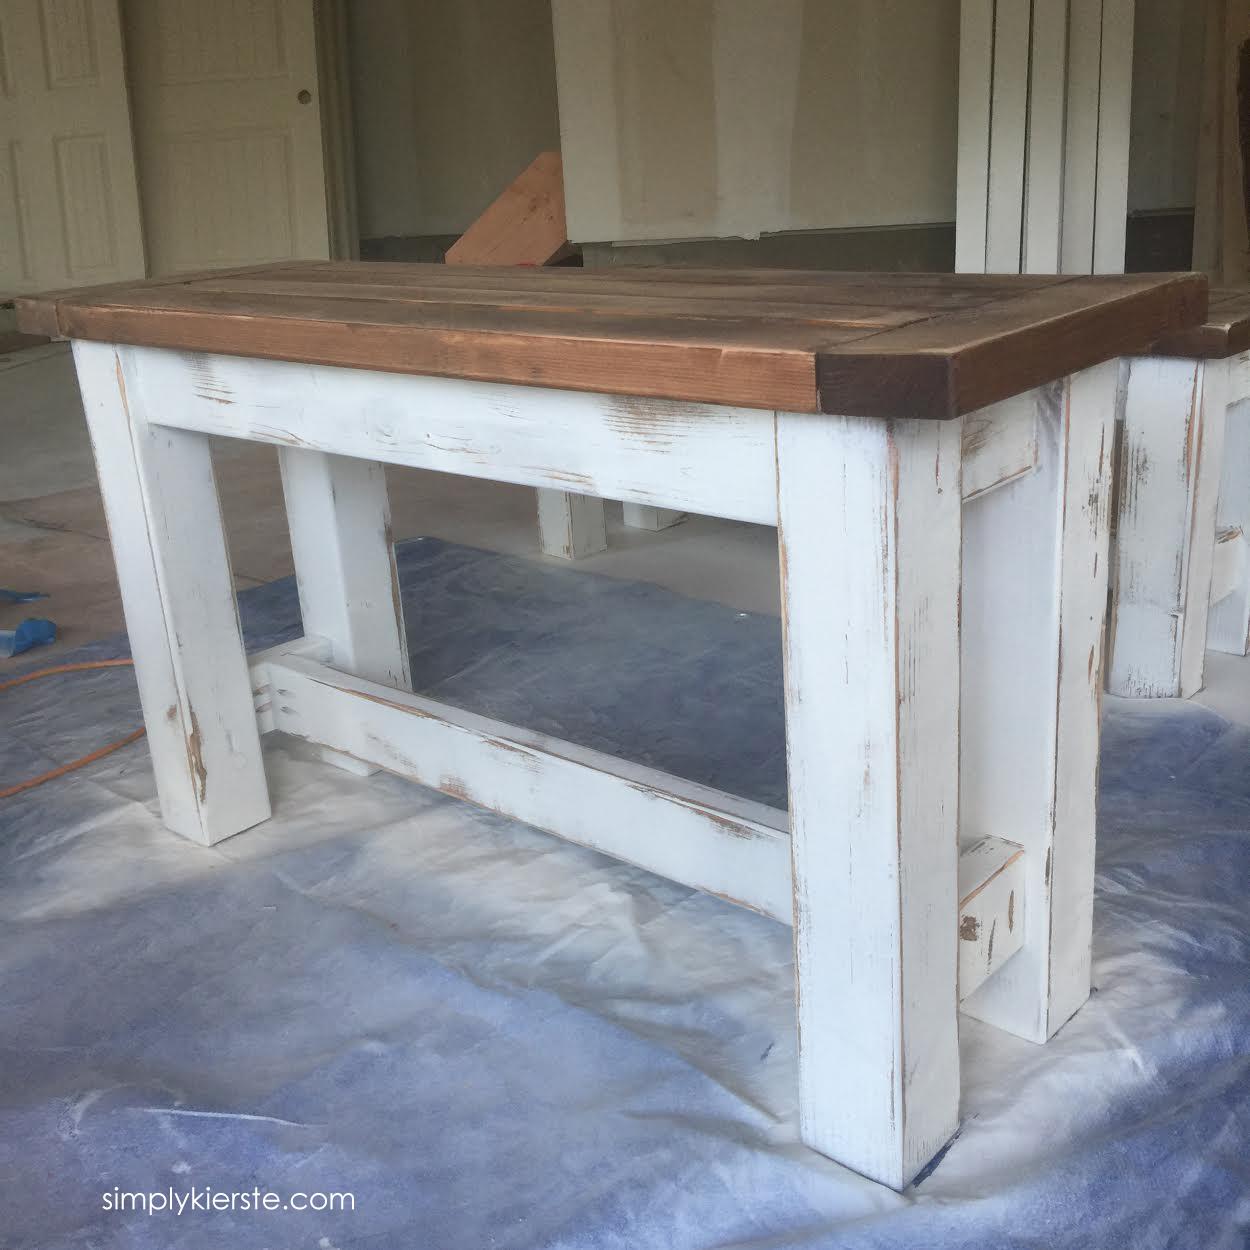 Marvelous Diy Kitchen Benches Budget Kitchen Ideas Farmhouse Style Beatyapartments Chair Design Images Beatyapartmentscom